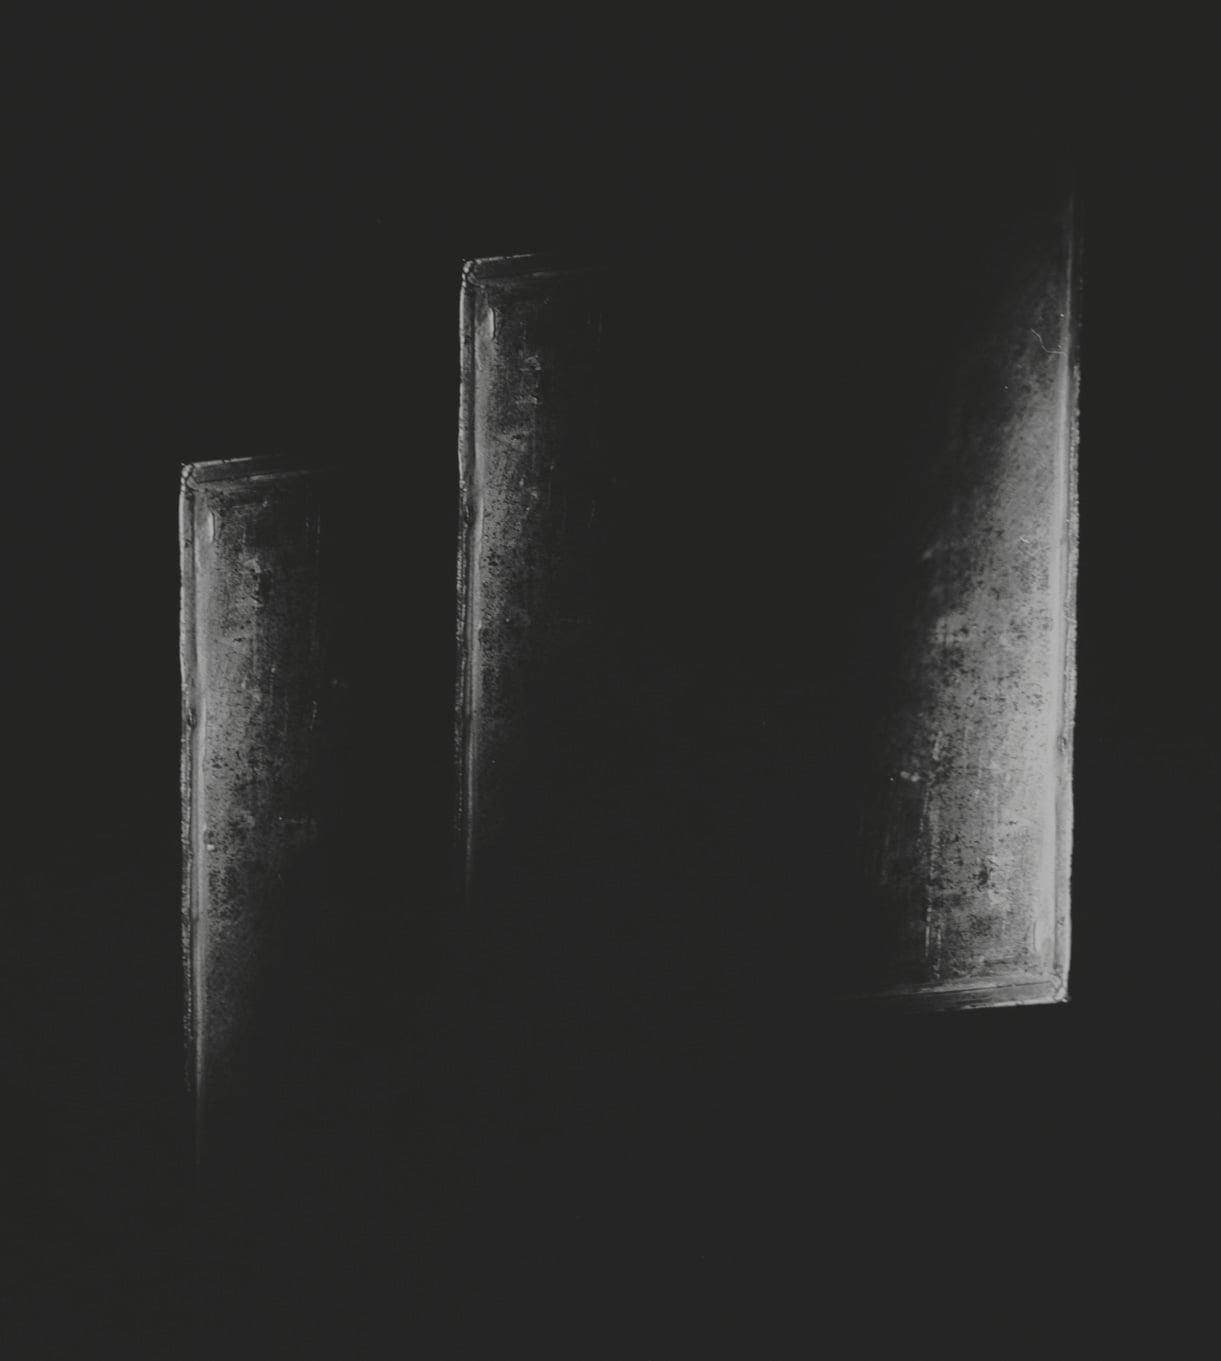 Johanna Daab | Sublimierung der Tatsachen, 2015 | 100 x 120 cm, Silbergelatineabzug